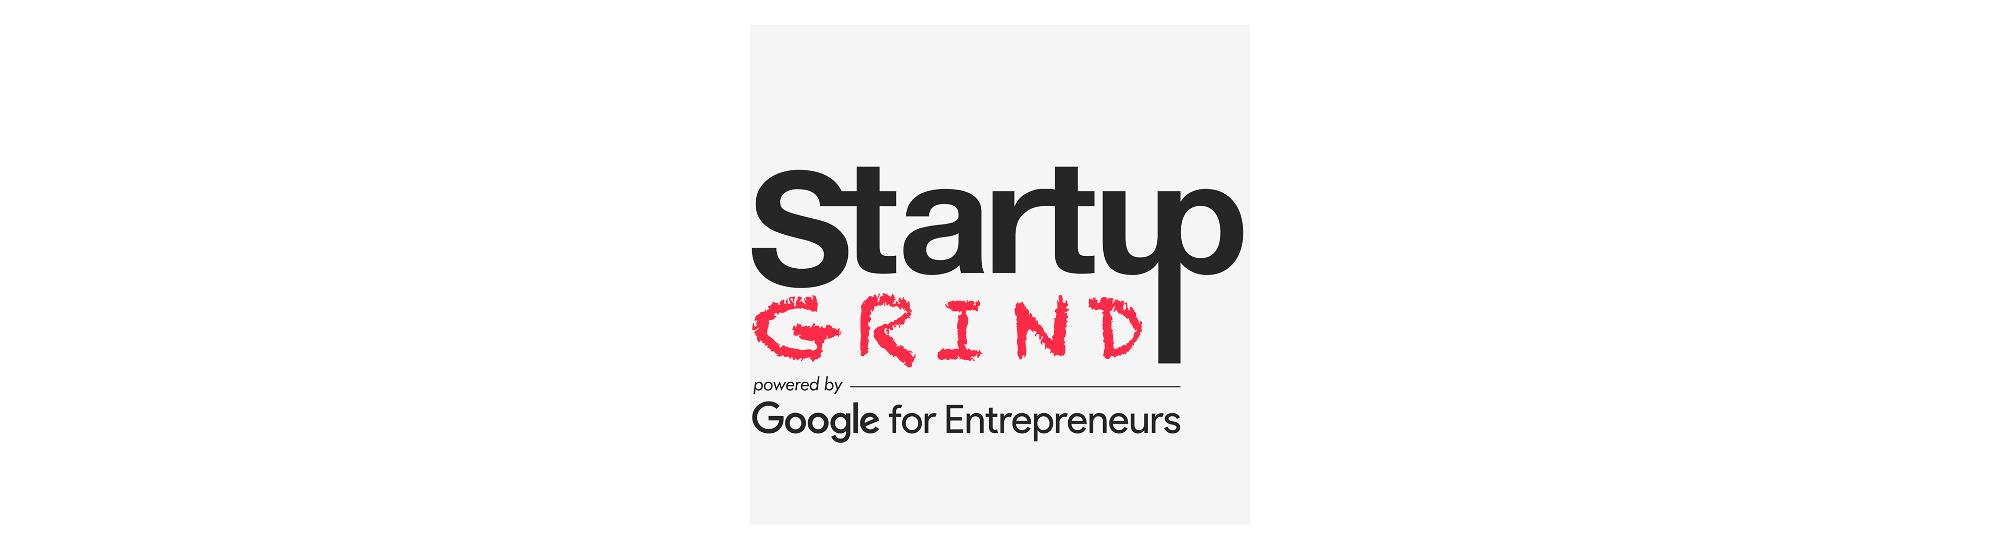 Encontro da Startup Grind discute empregabilidade na Era Digital